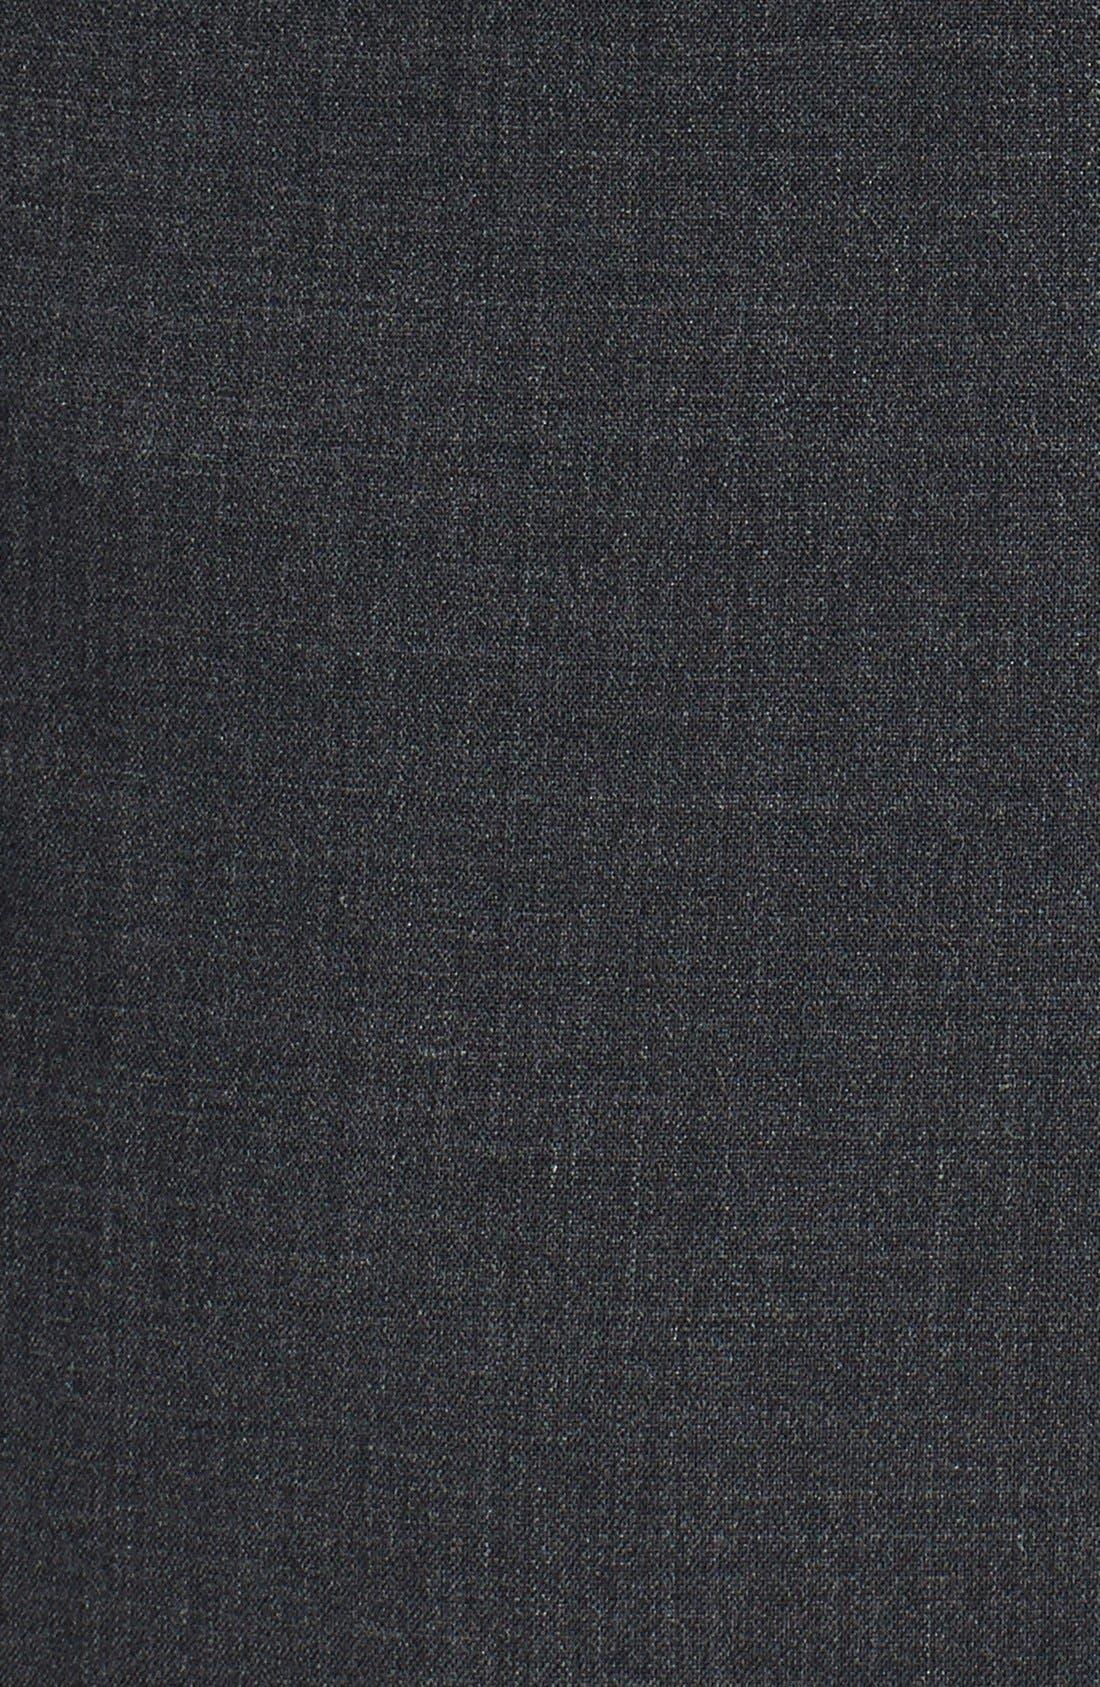 Alternate Image 3  - BOSS 'Dilina' Stretch Wool Suiting Sheath Dress